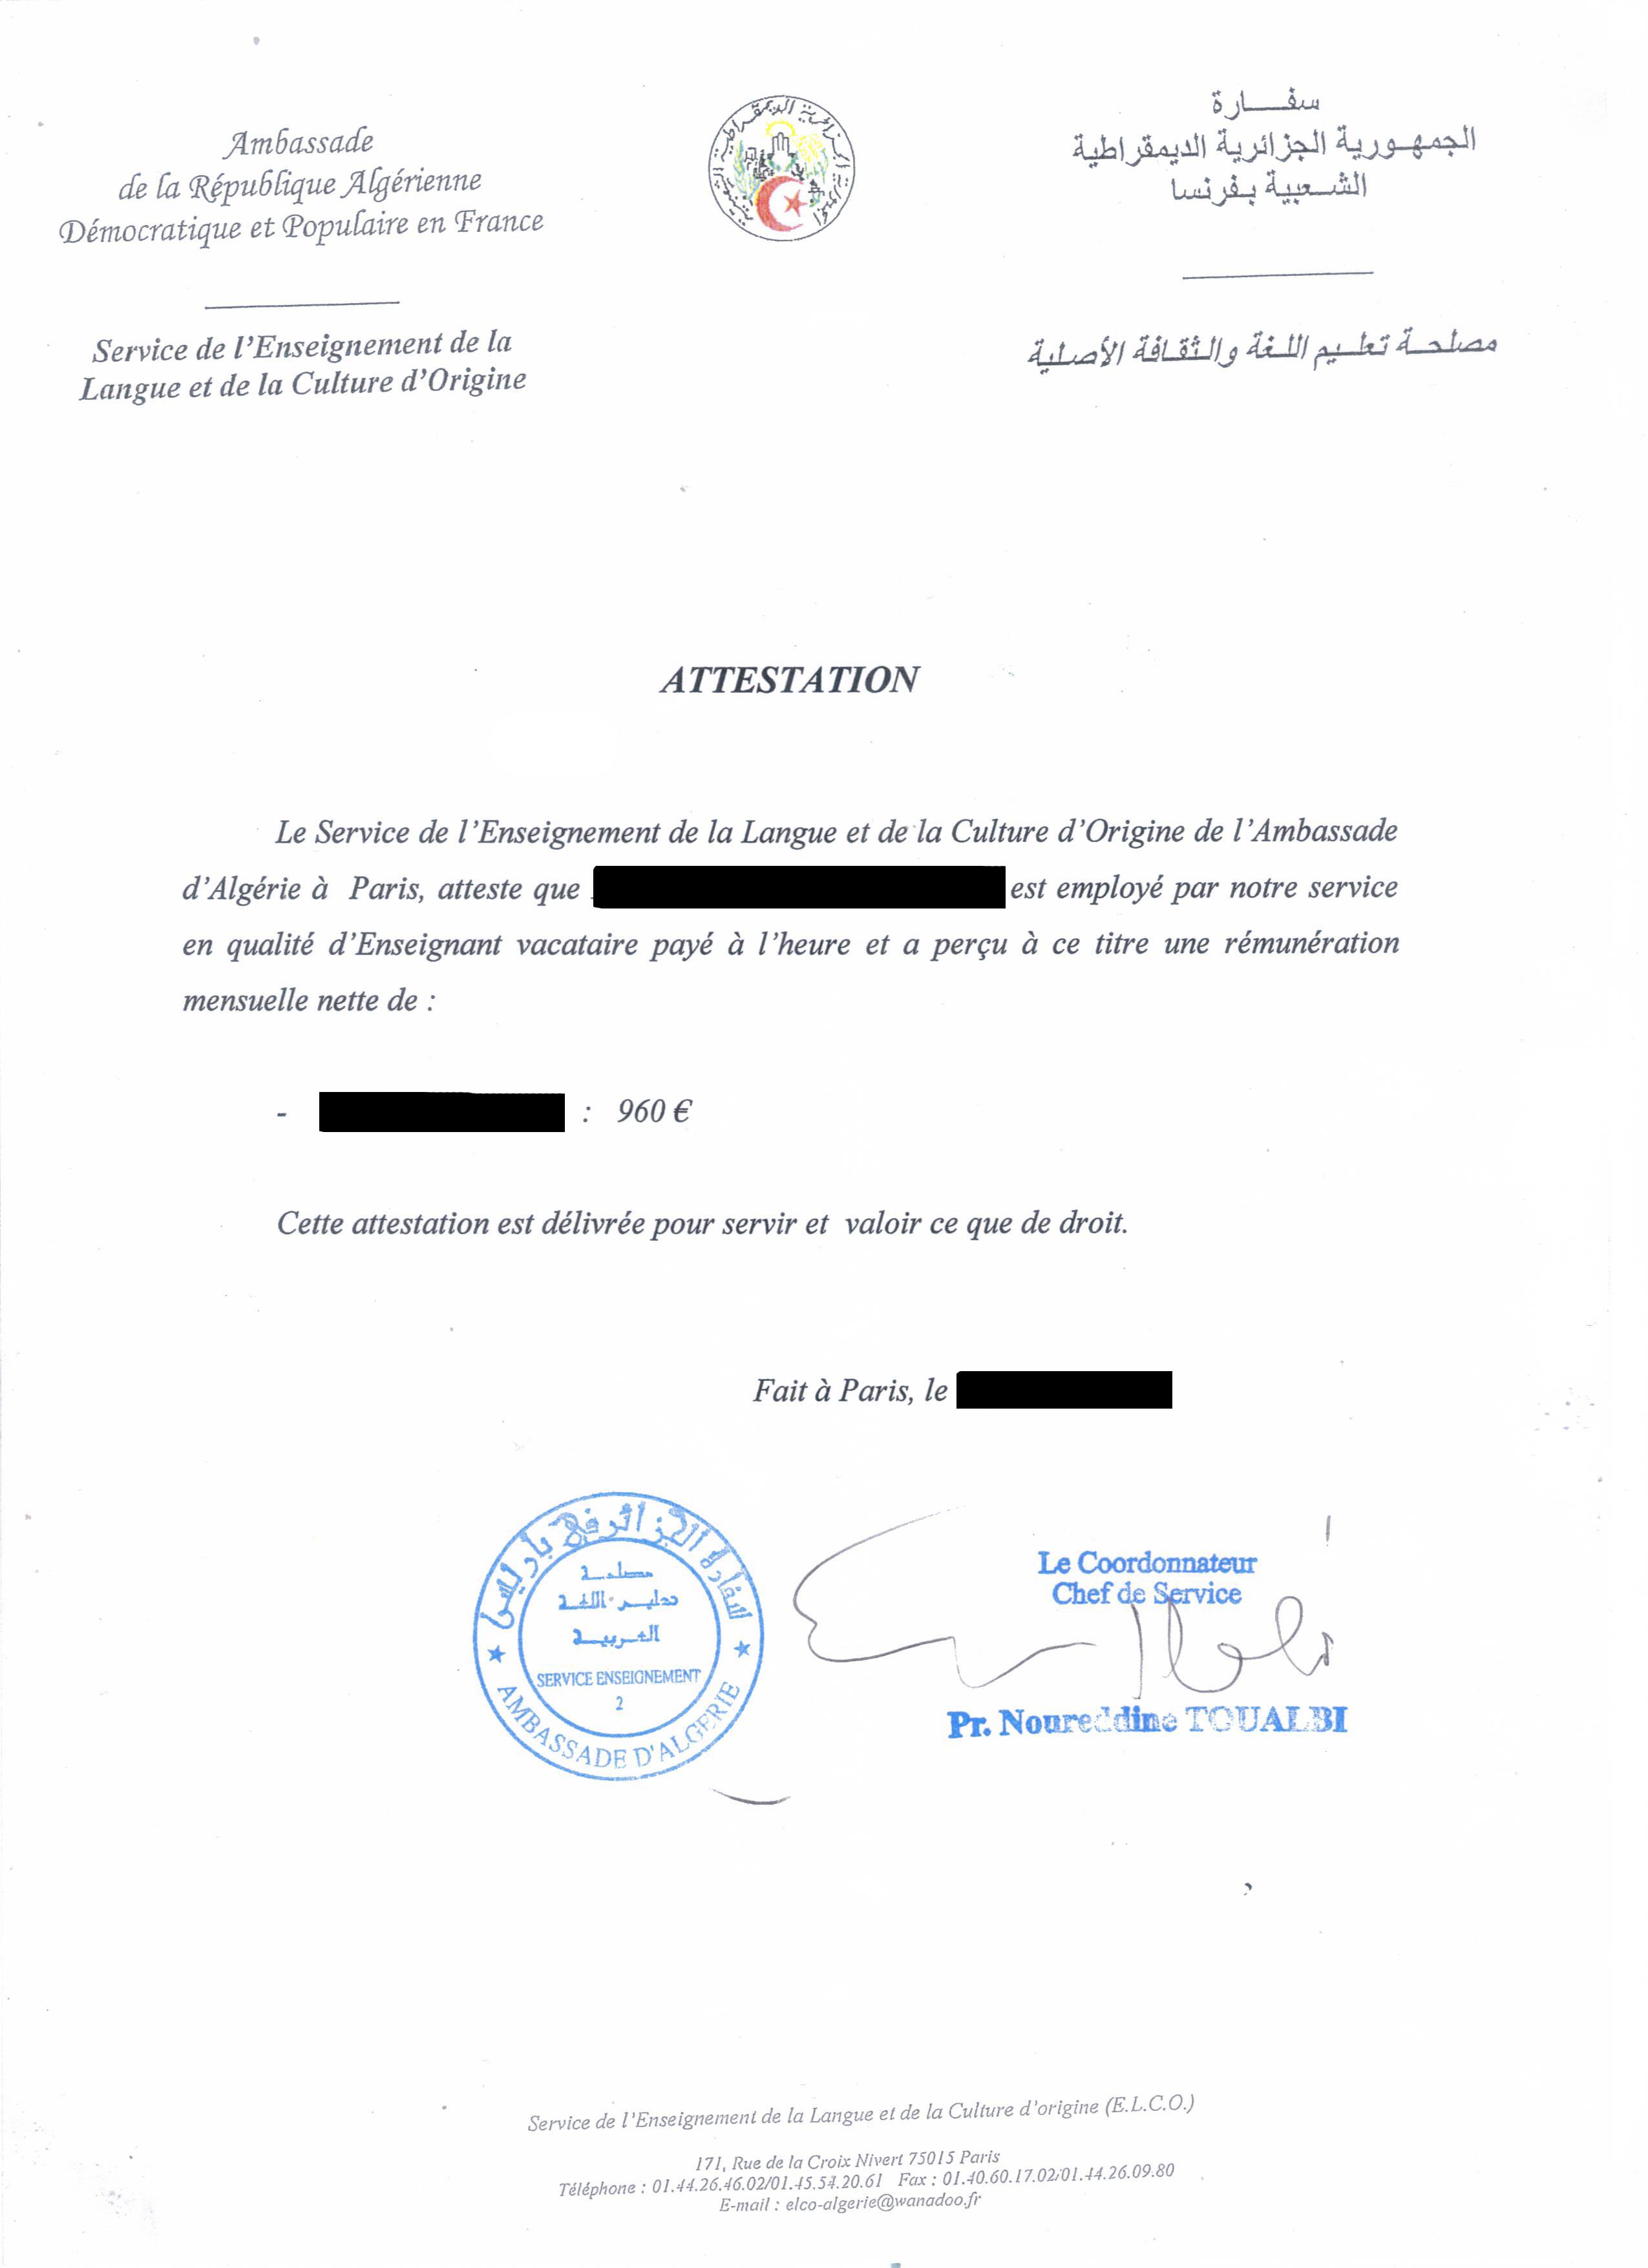 2014-02-21-ambassadealgerie.jpg